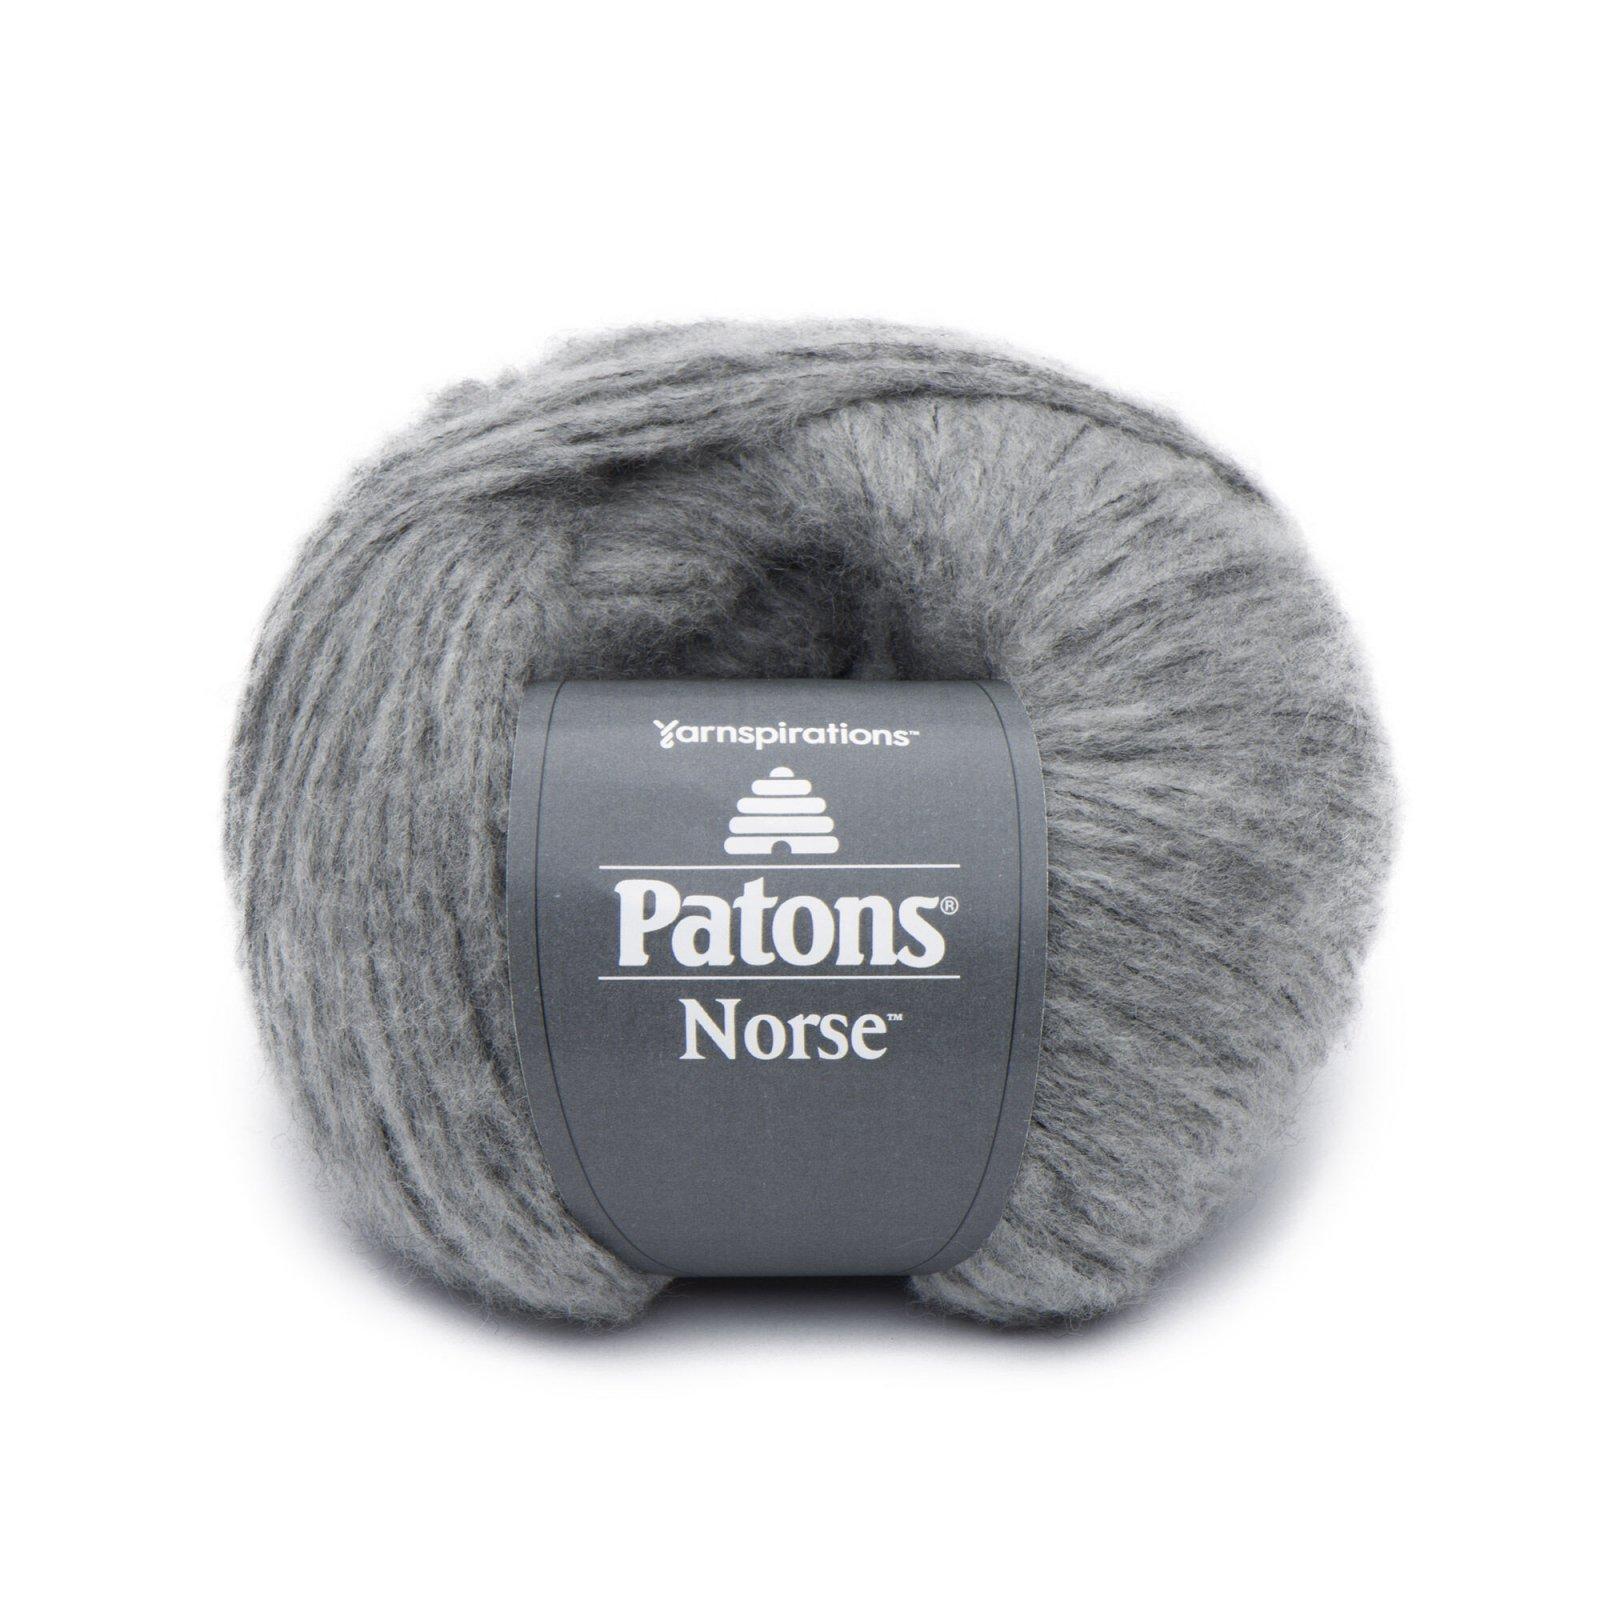 Patons Norse Yarn - Grey Pearl 91002